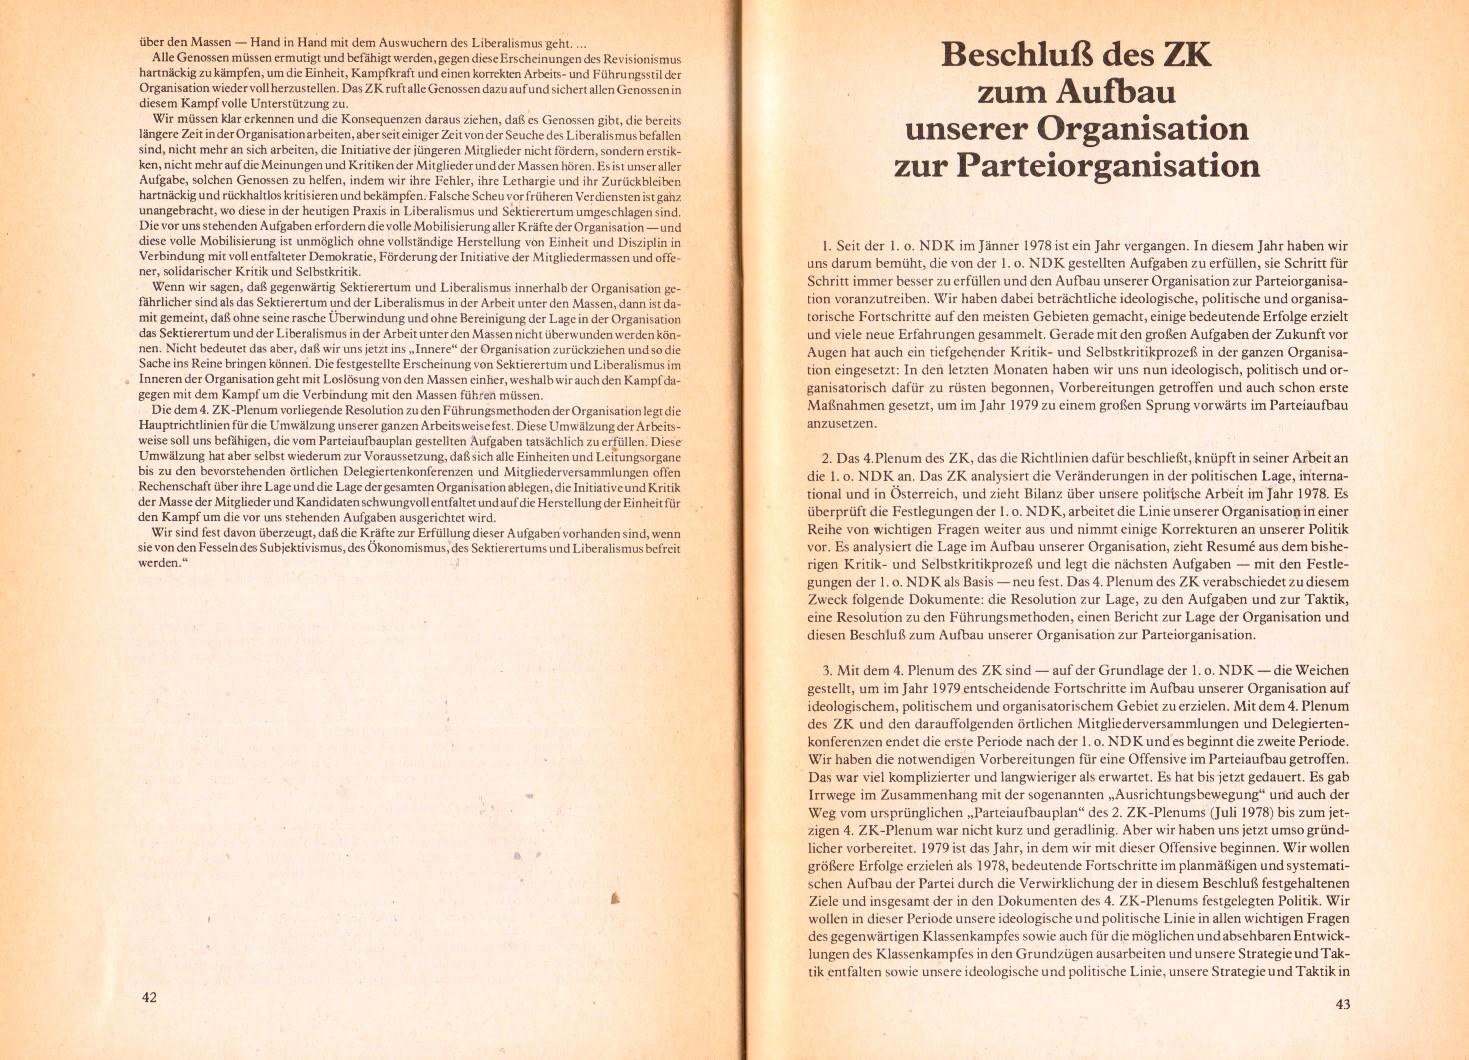 KBOe_1979_Doku_ZK_Plenum_04_23